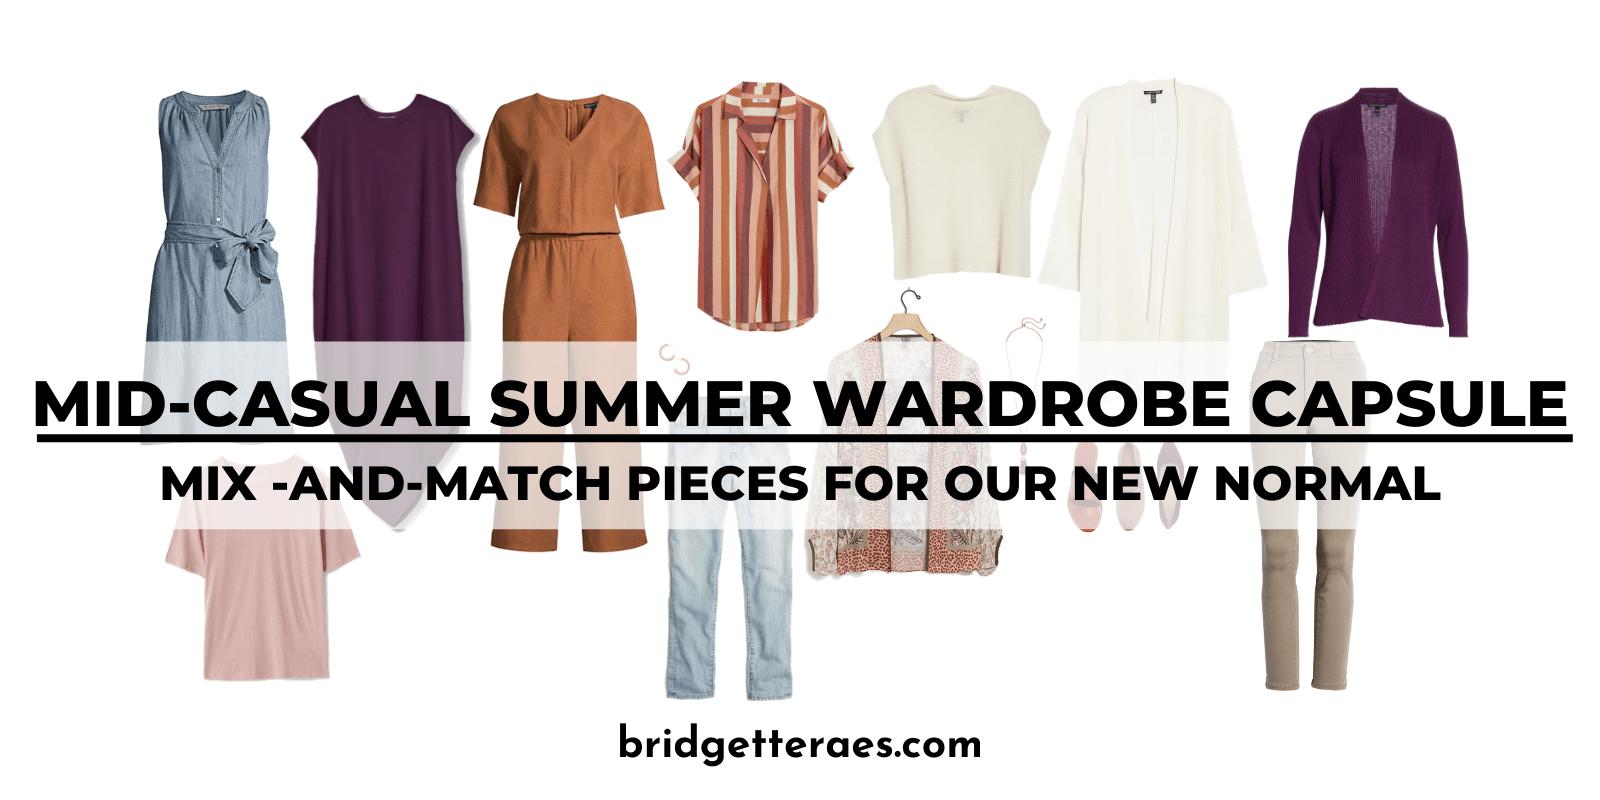 Mid-Casual Summer Wardrobe Capsule